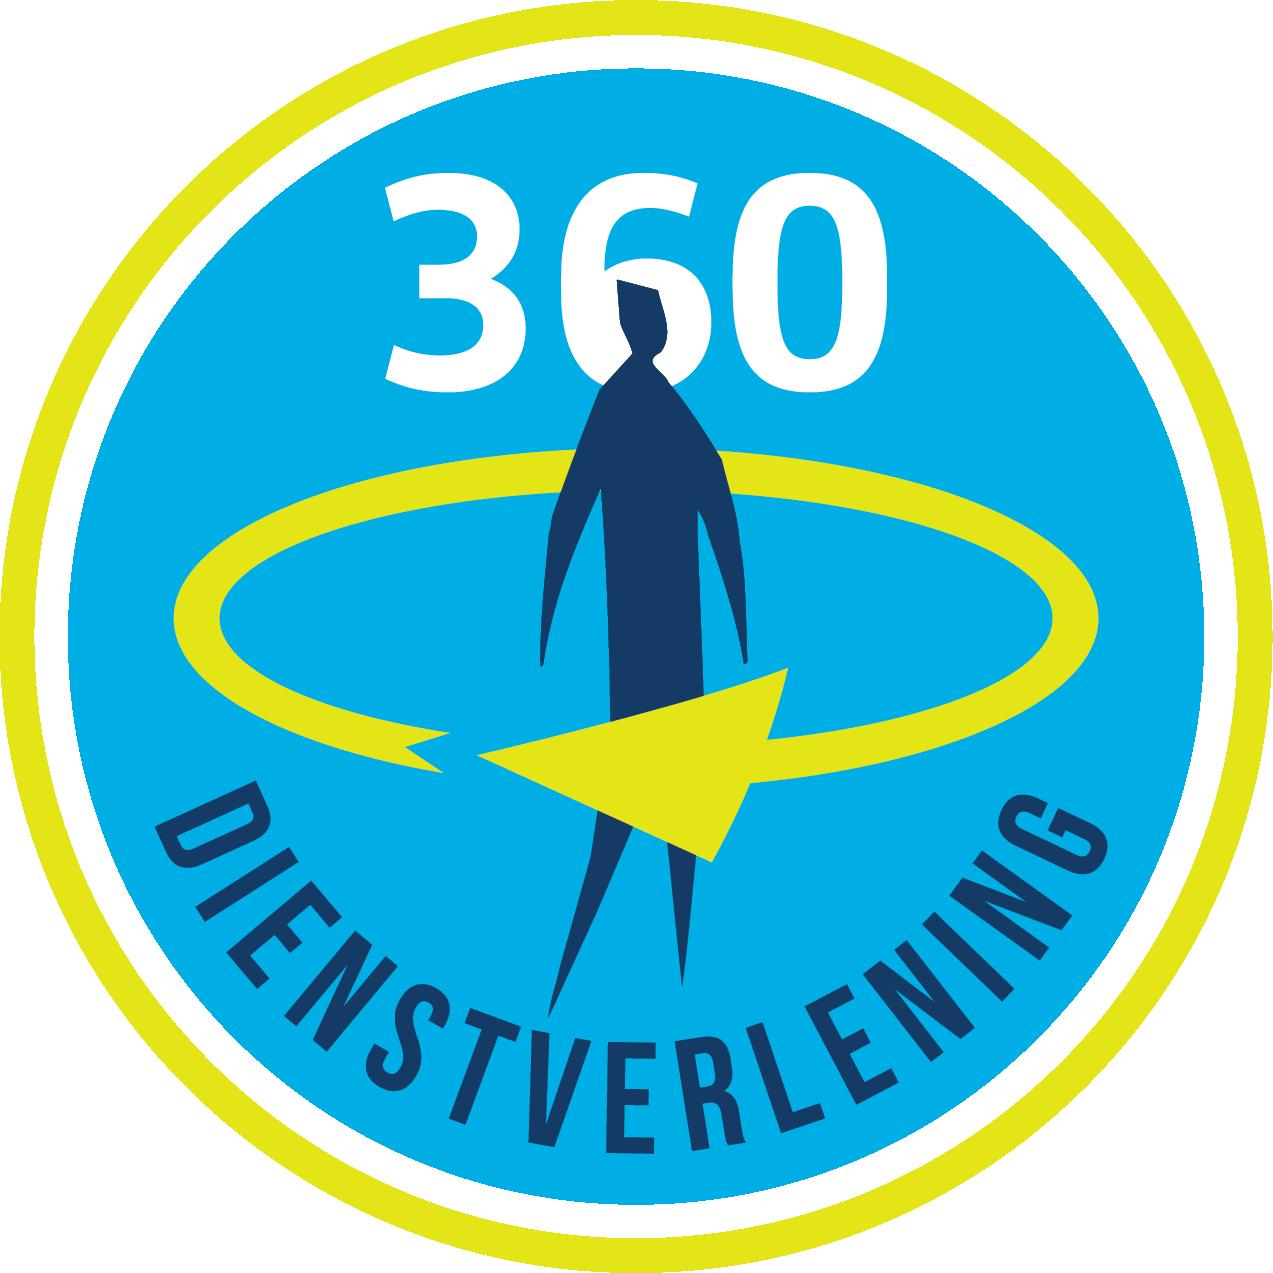 aclvb-universele_diensten-logo-cmyk_ok-2_8.png